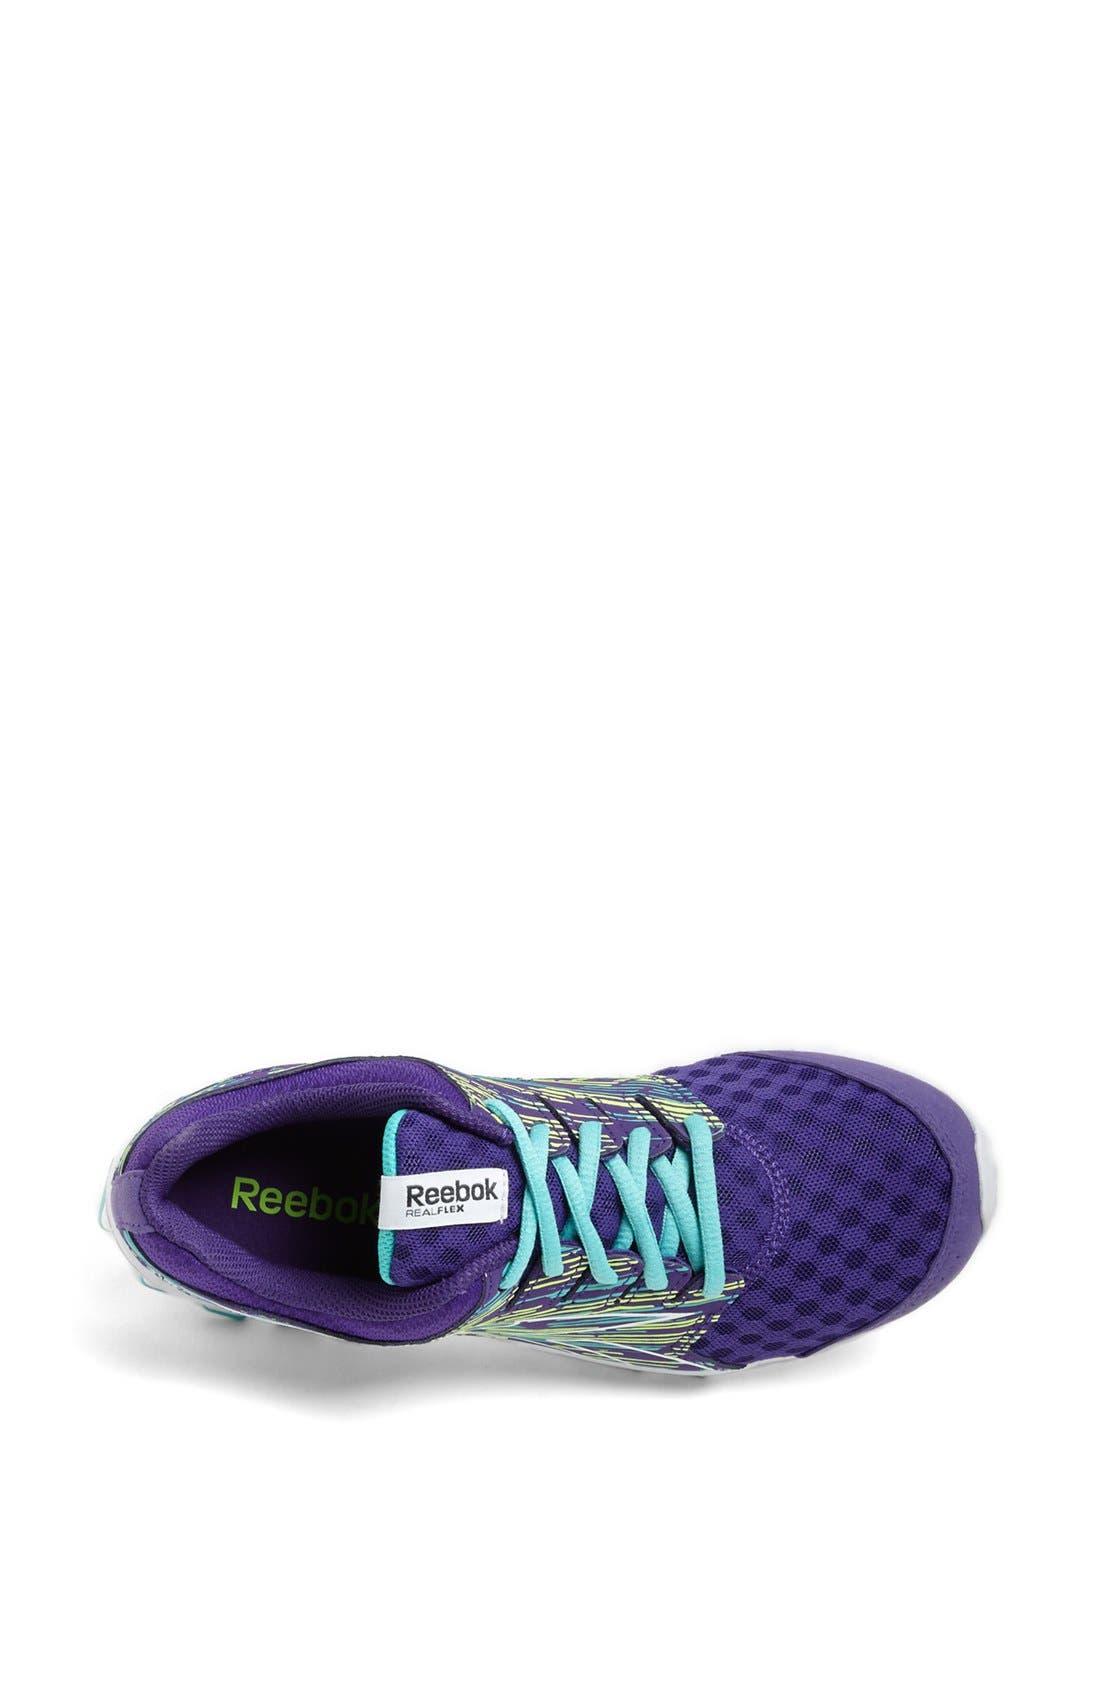 Alternate Image 3  - Reebok 'RealFlex Scream 3.0' Running Shoe (Women)